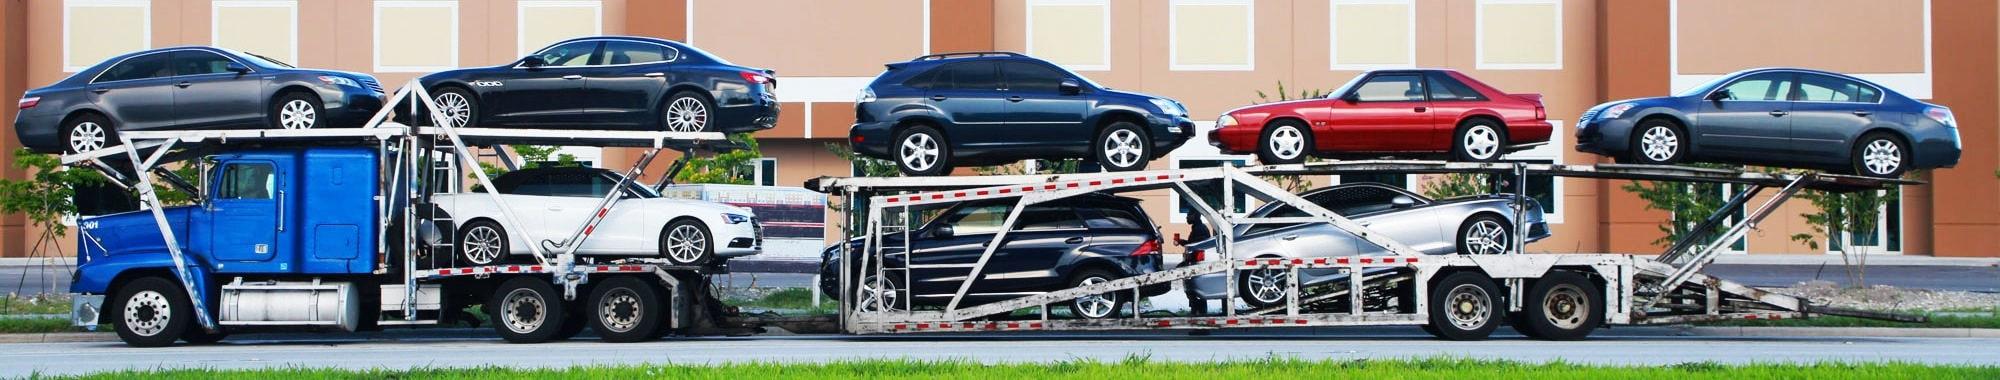 Open Car Hauler For 8 vehicles